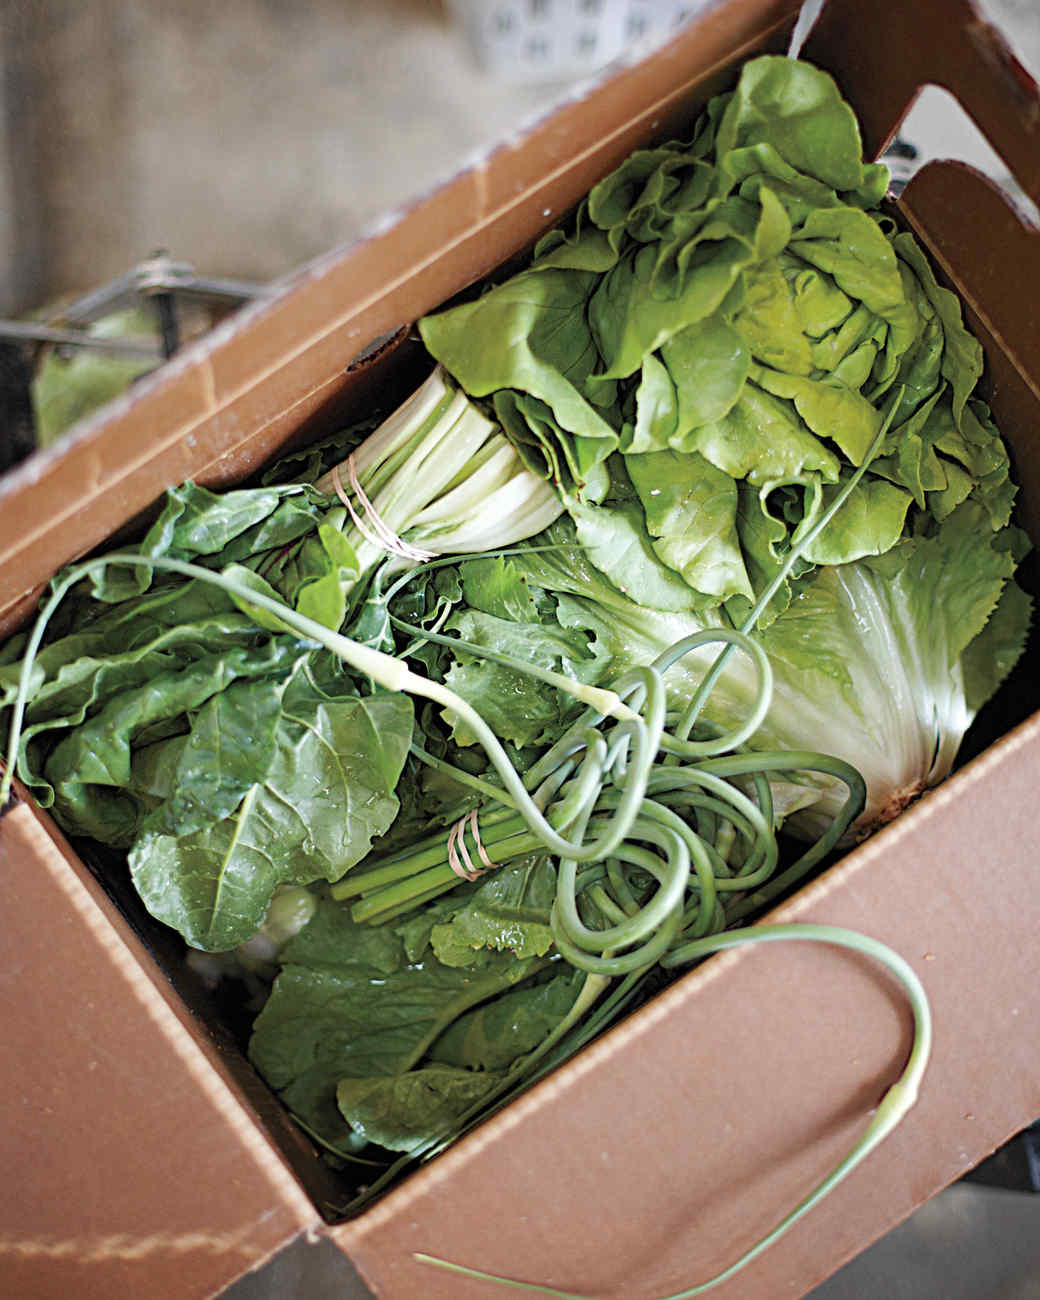 vegetable-box-0611mbd106092-109.jpg